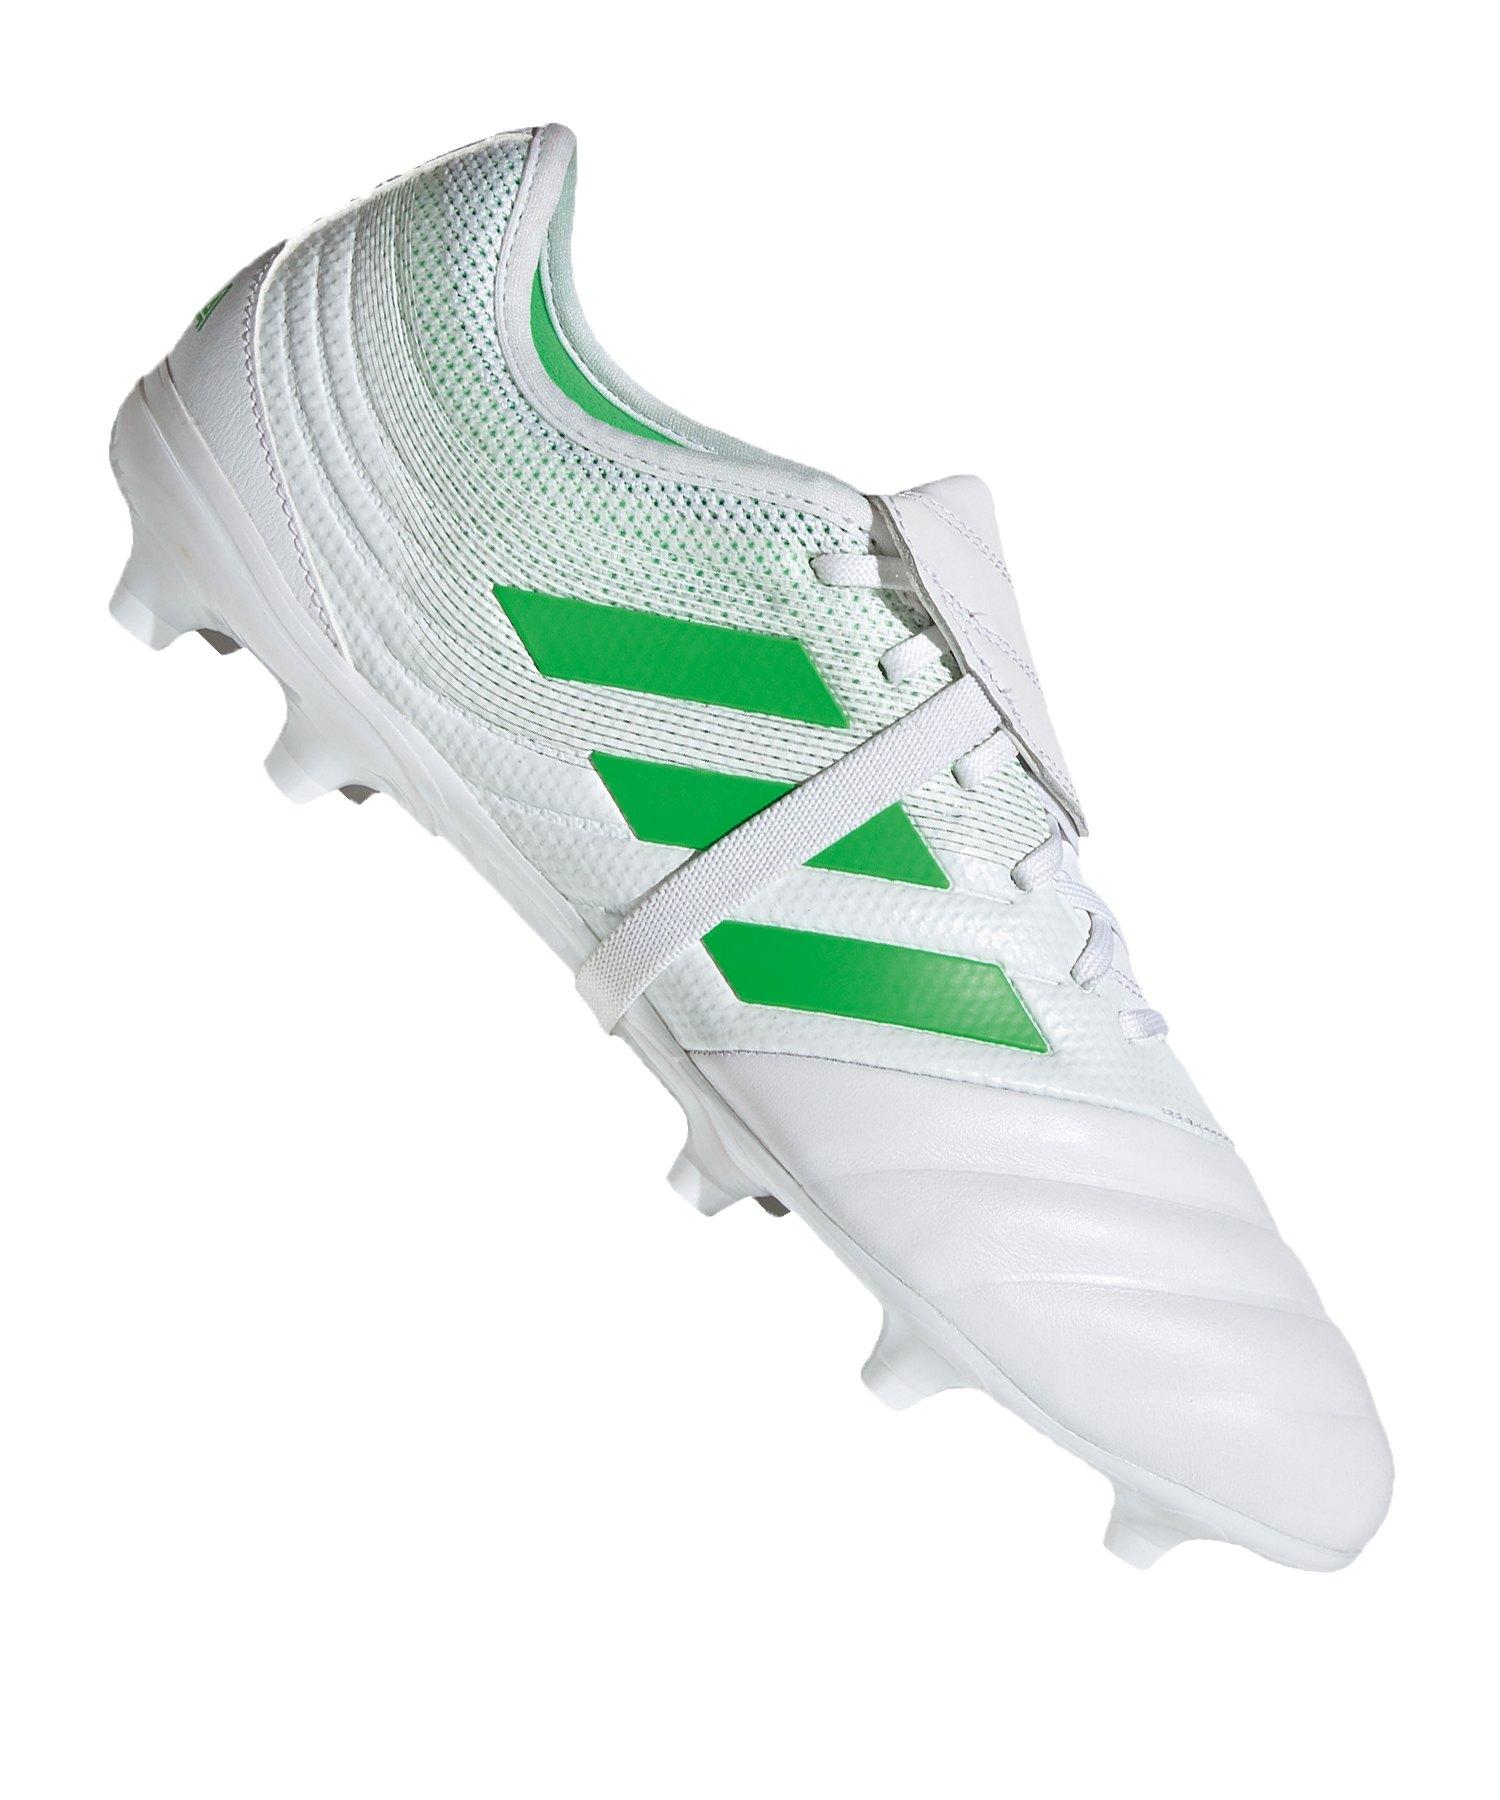 Adidas Fussballschuhe & bekleidung